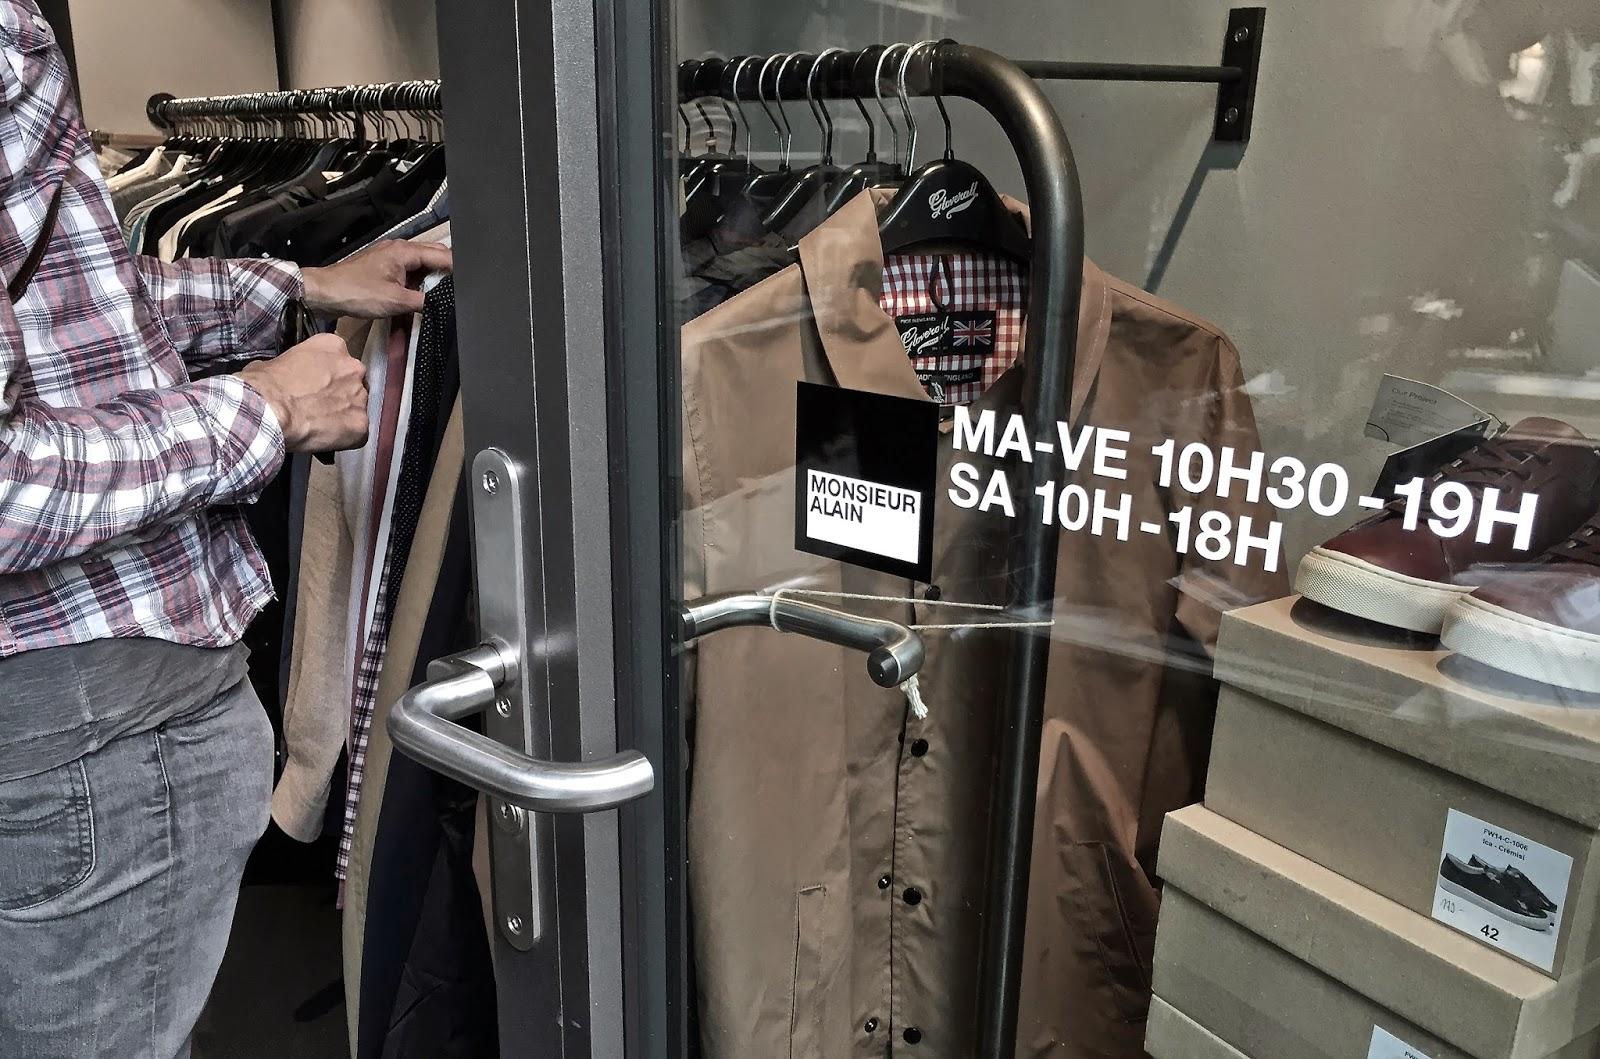 Monsieur Alain tienda chula ropa hombre Lausanne hipster